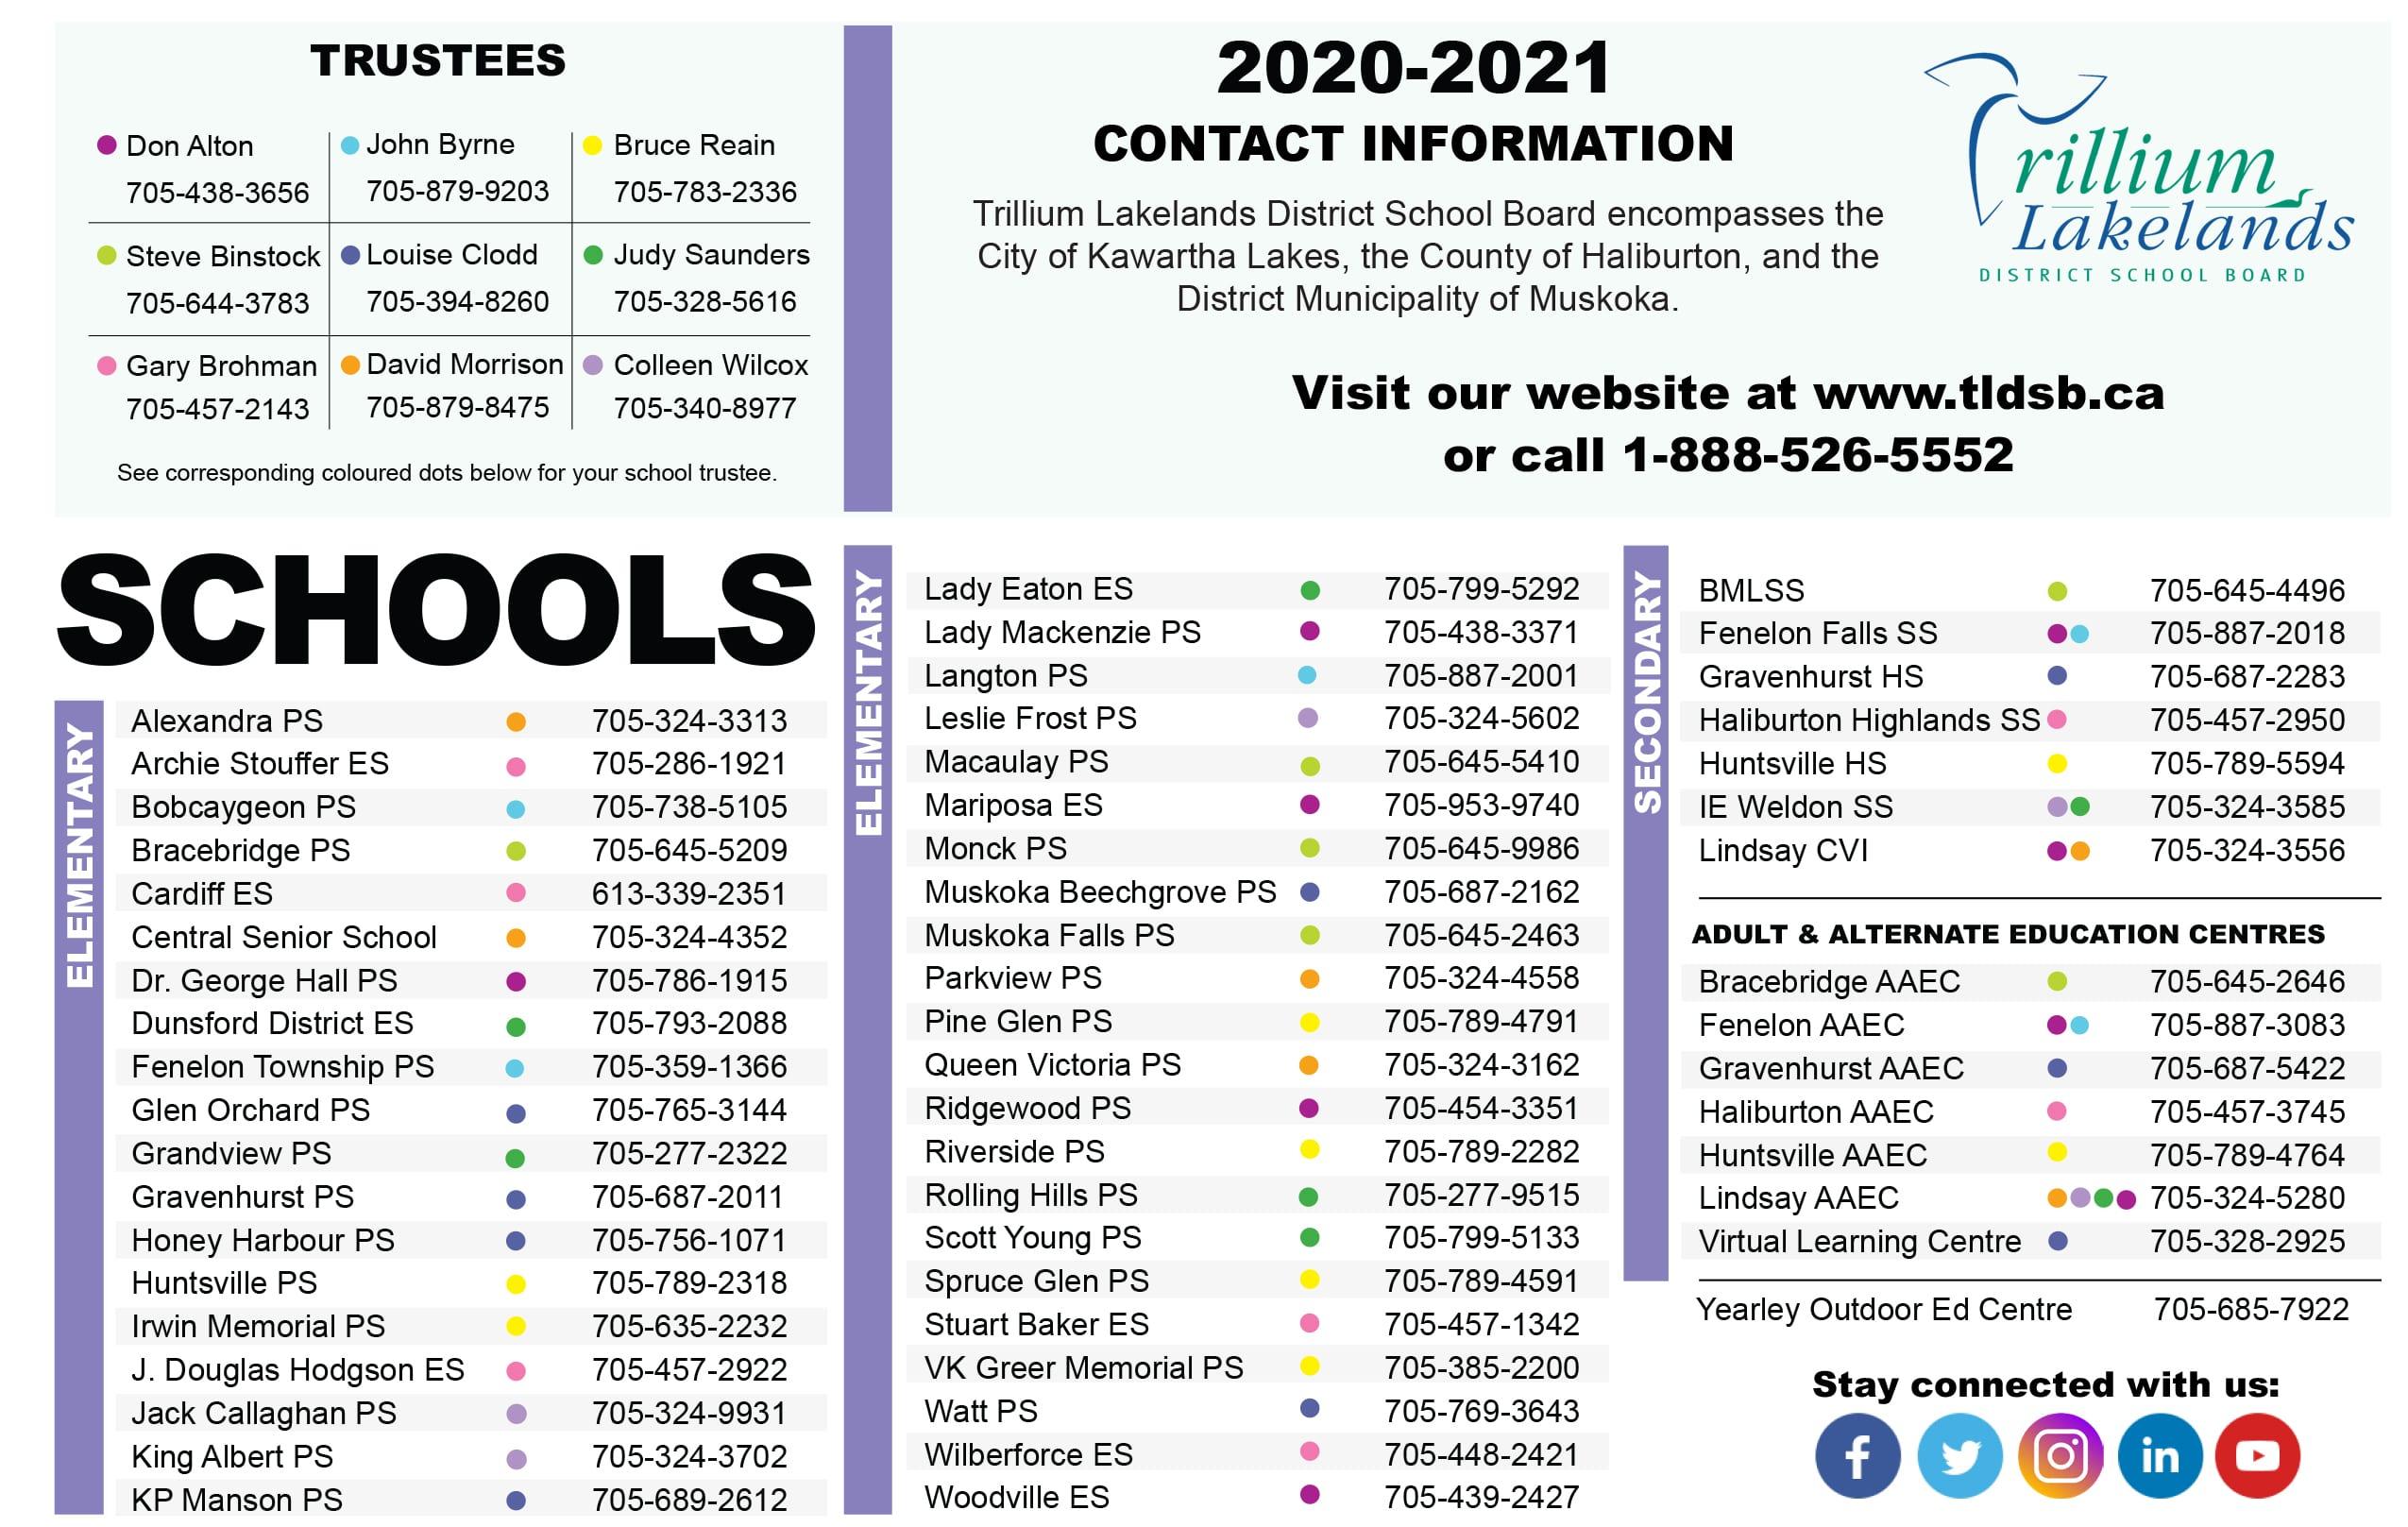 Calendar – Gravenhurst High School throughout School Year Calender For 2021 Ydsb